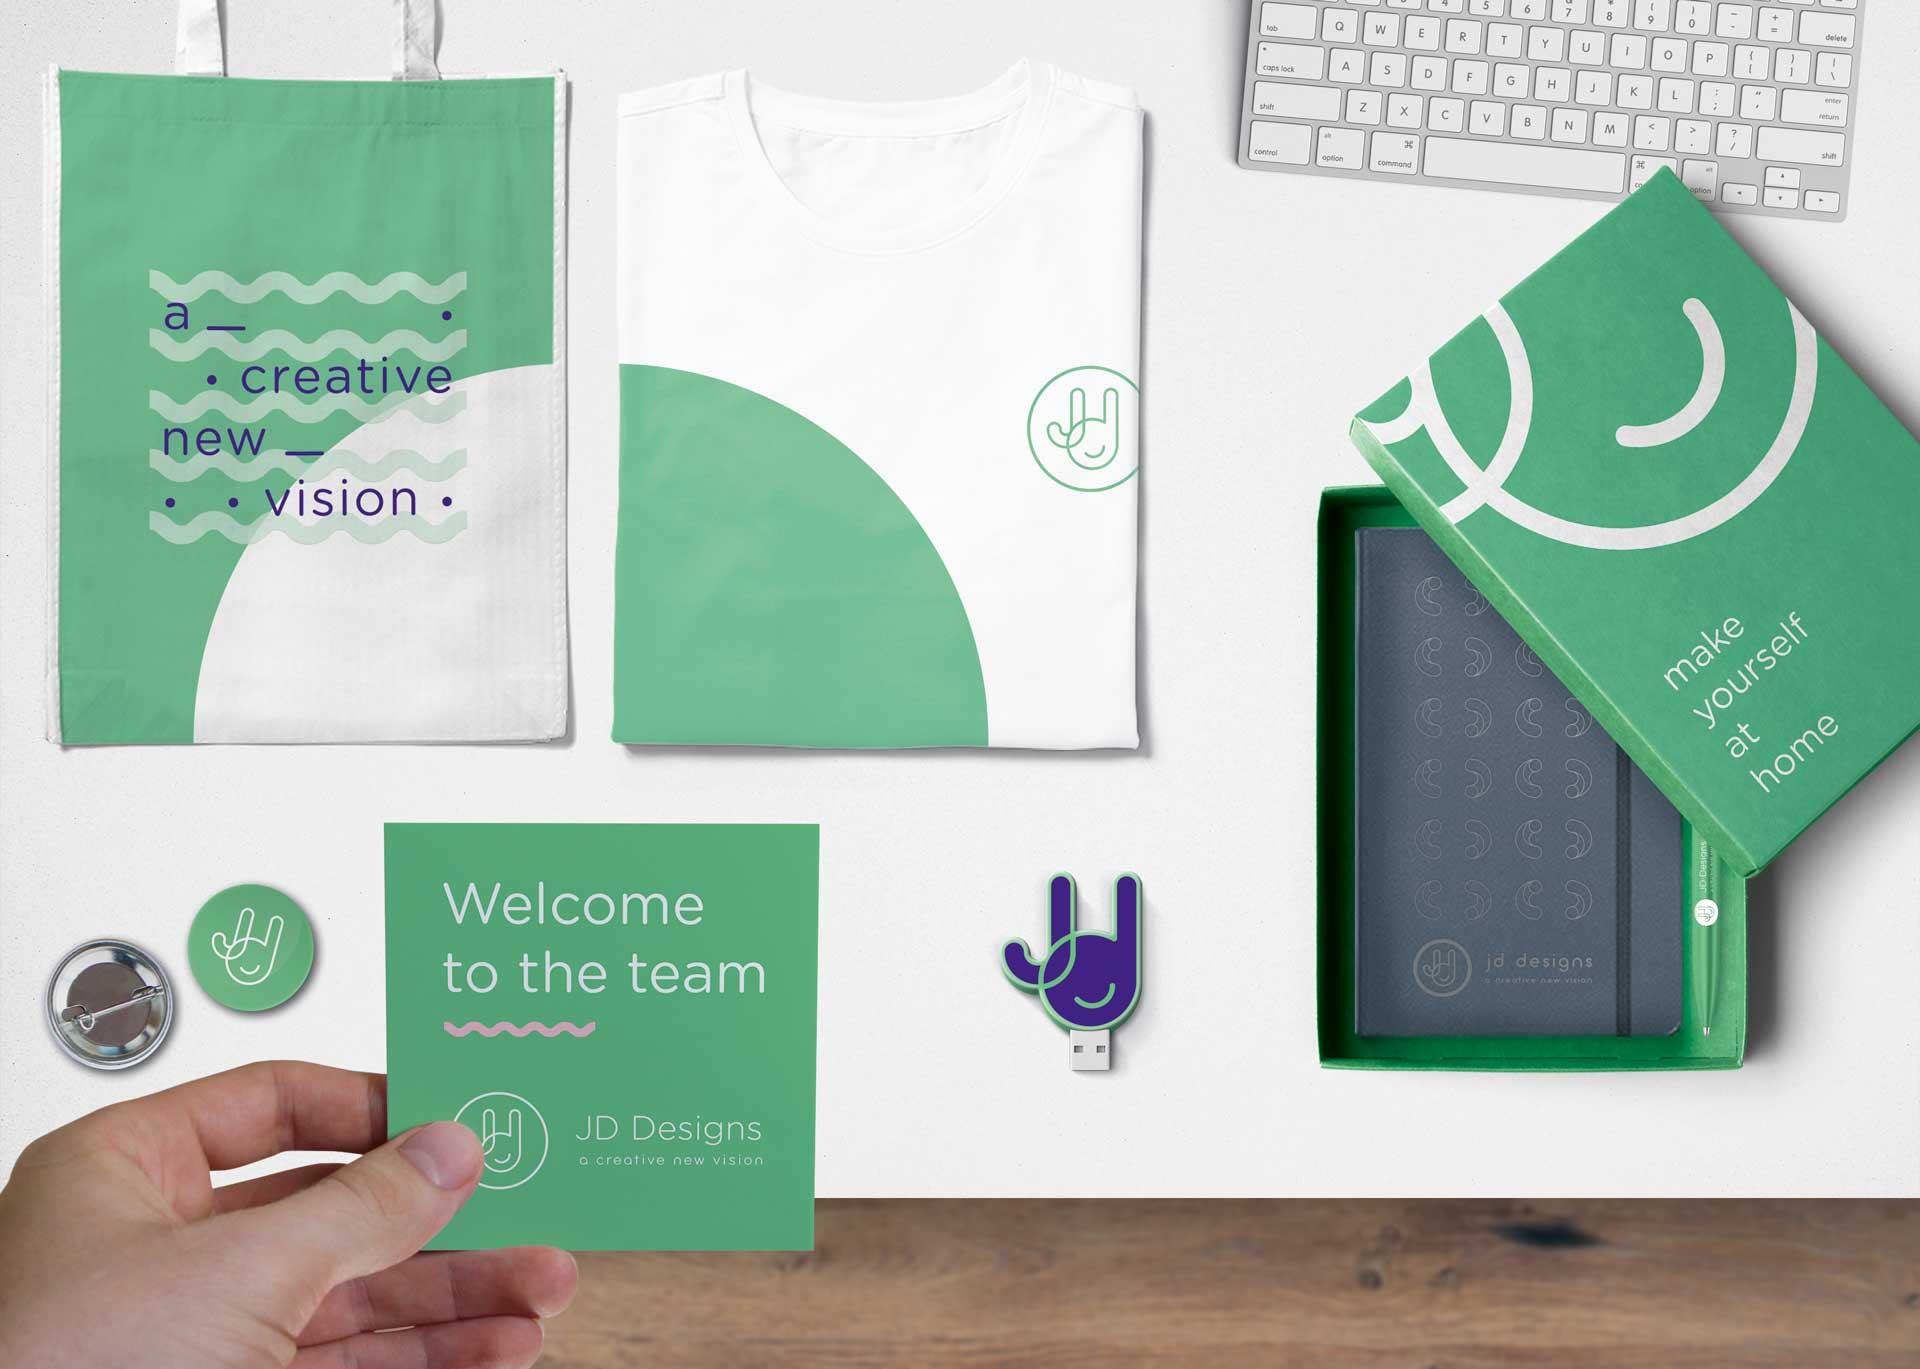 promotional merchandise onboarding kit design